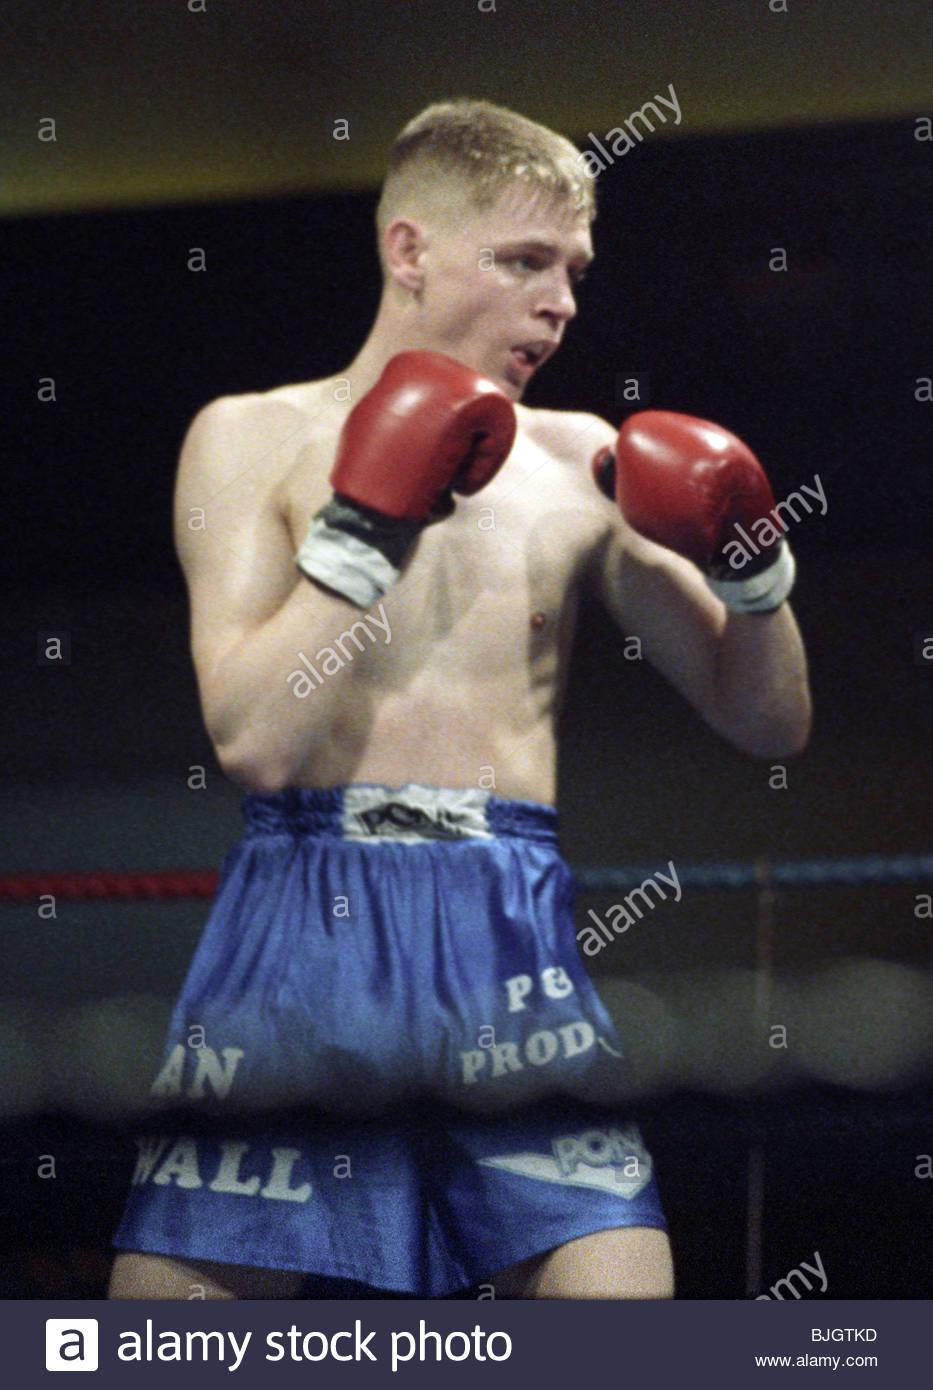 31.01.92 LIGHTWEIGHT CONTEST ALAN MCDOWAL V CHARLES SHEPPARD HOSPITALITY INN - GLASGOW Alan McDowall in Aktion Stockbild